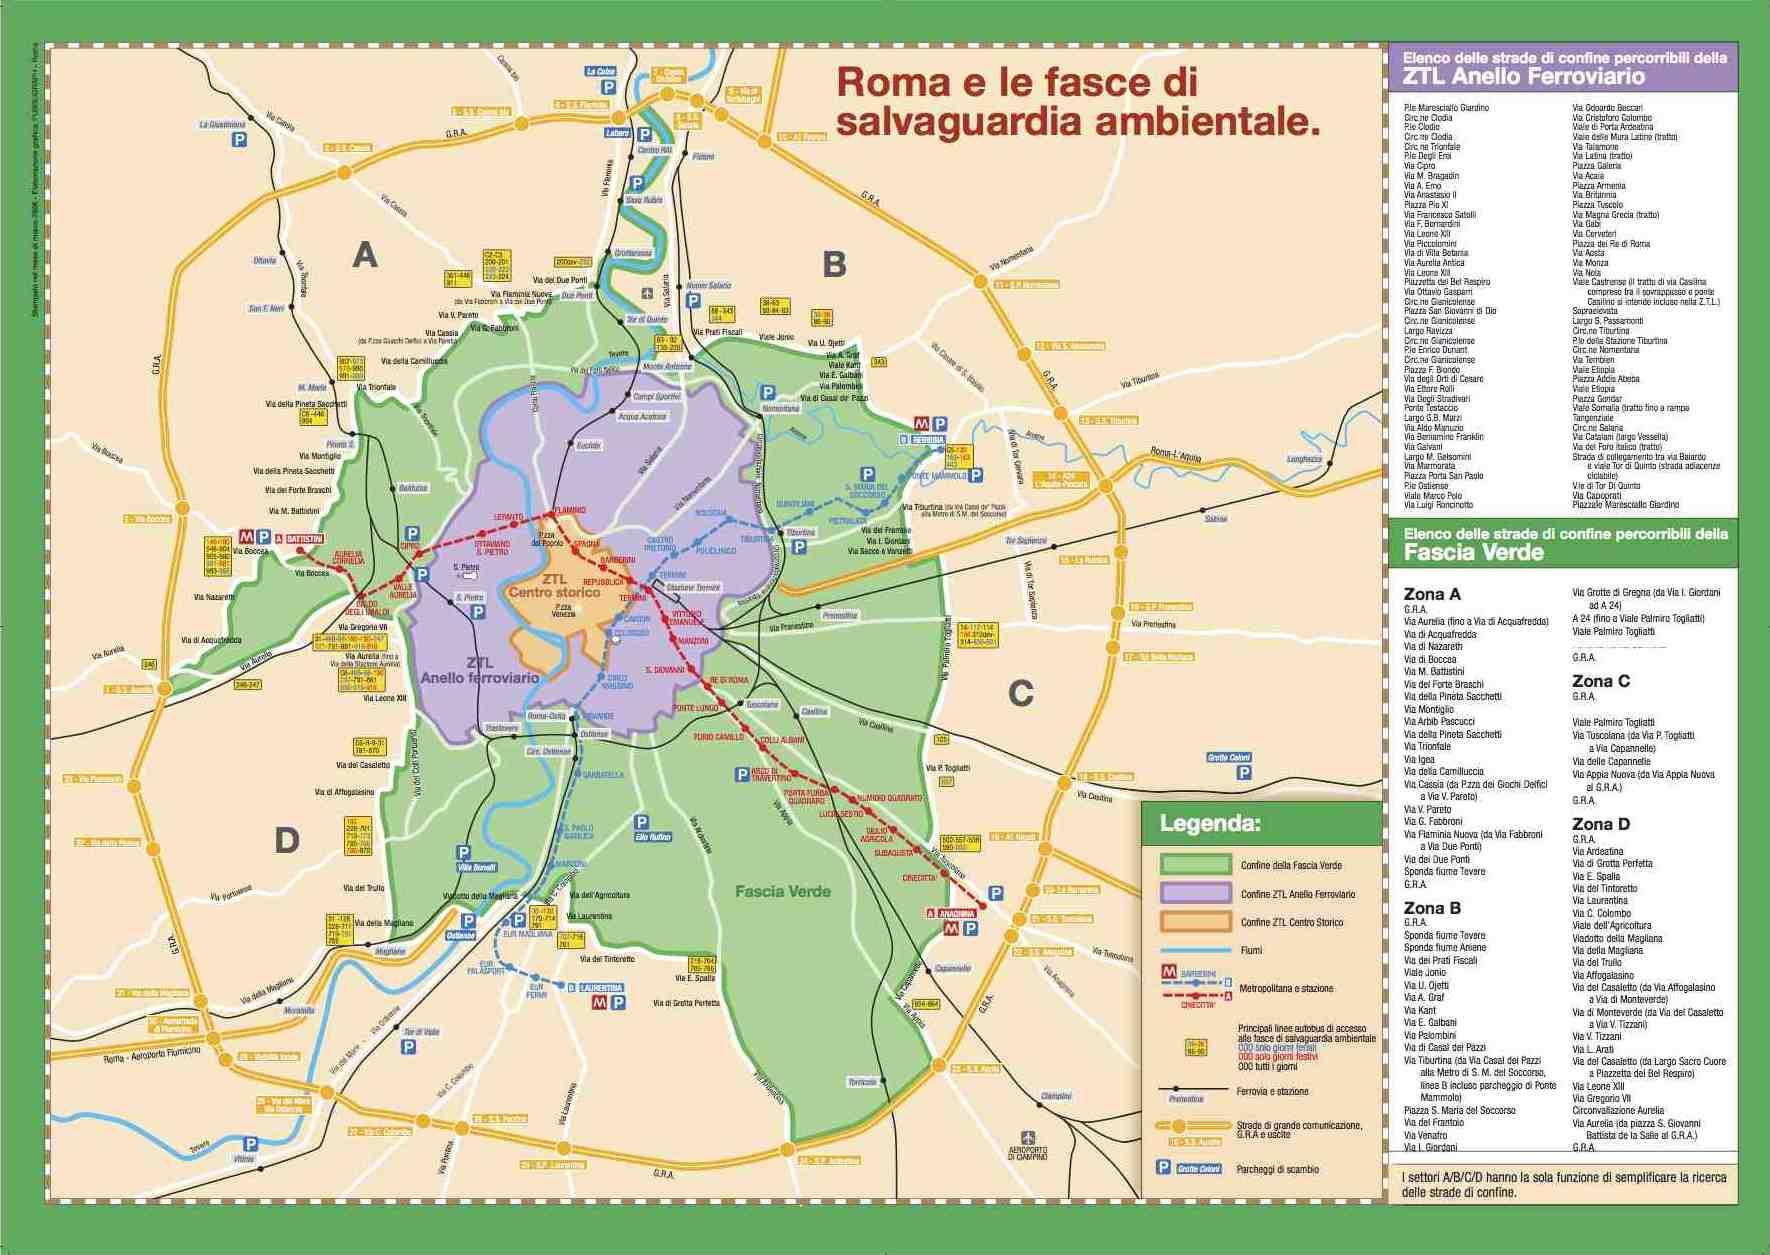 Fascia Verde, Roma